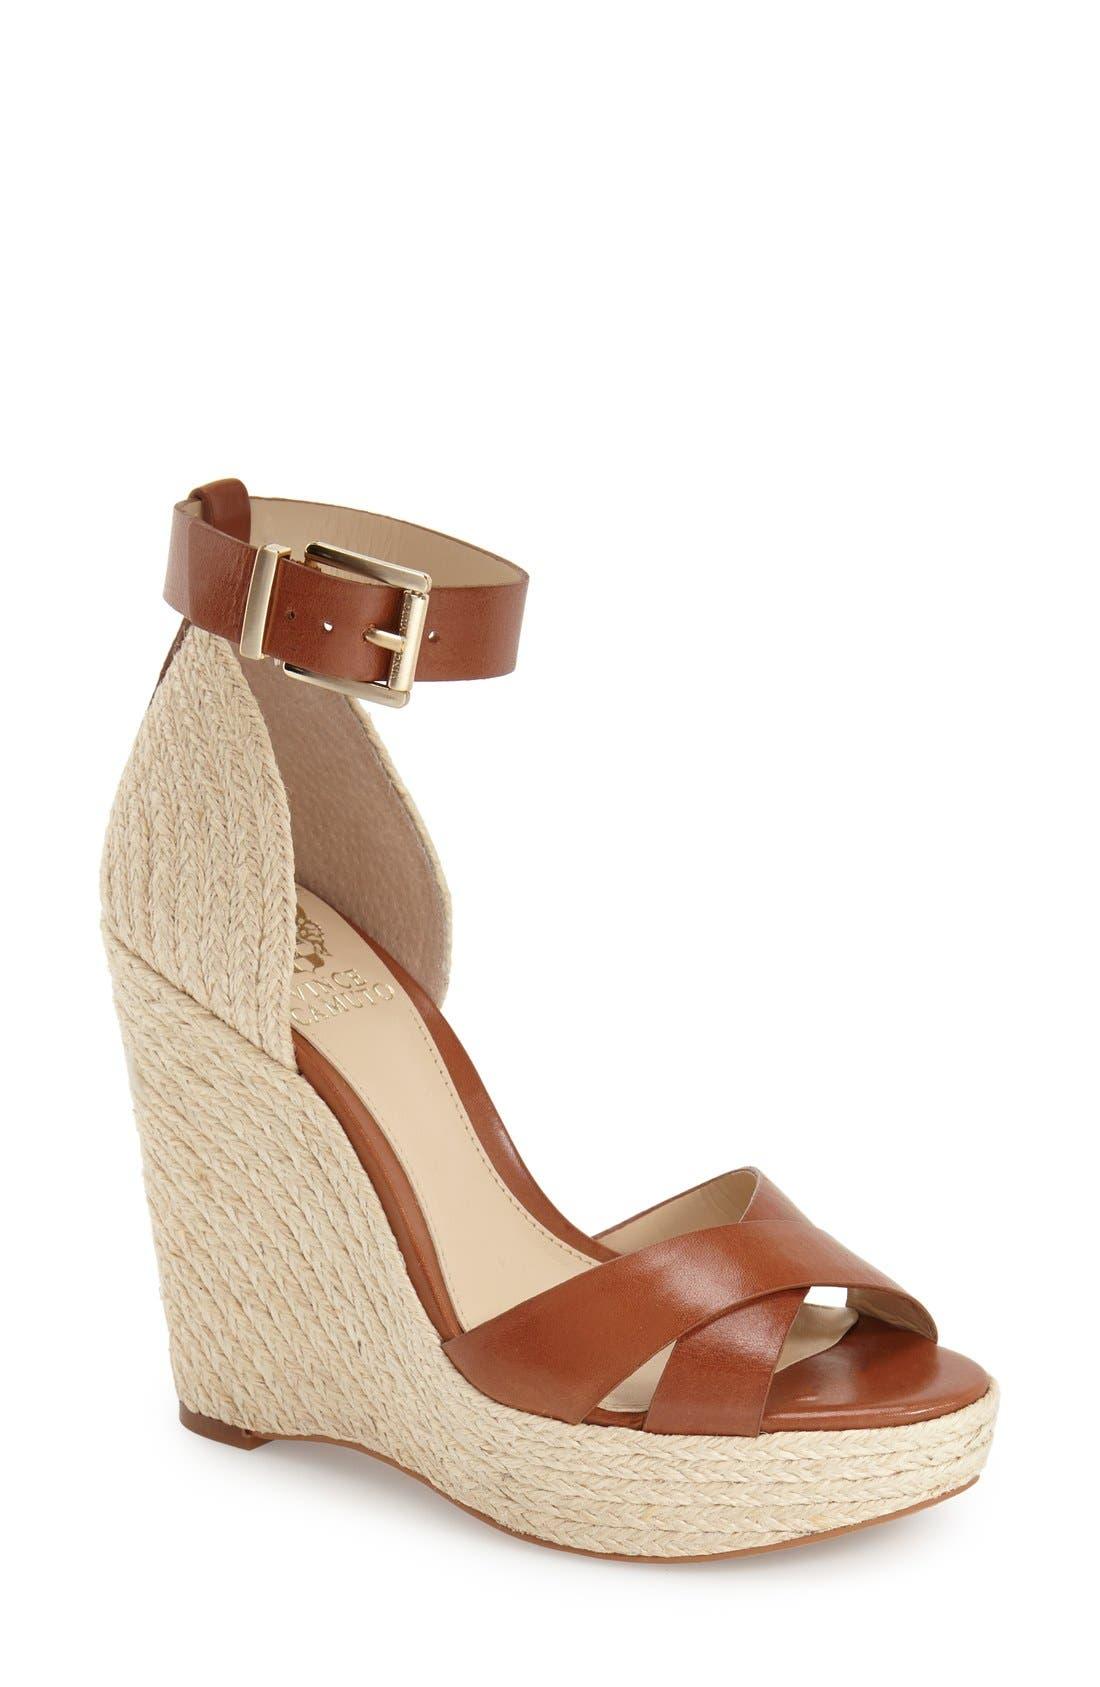 Alternate Image 1 Selected - Vince Camuto 'Maurita' Sandal (Women)